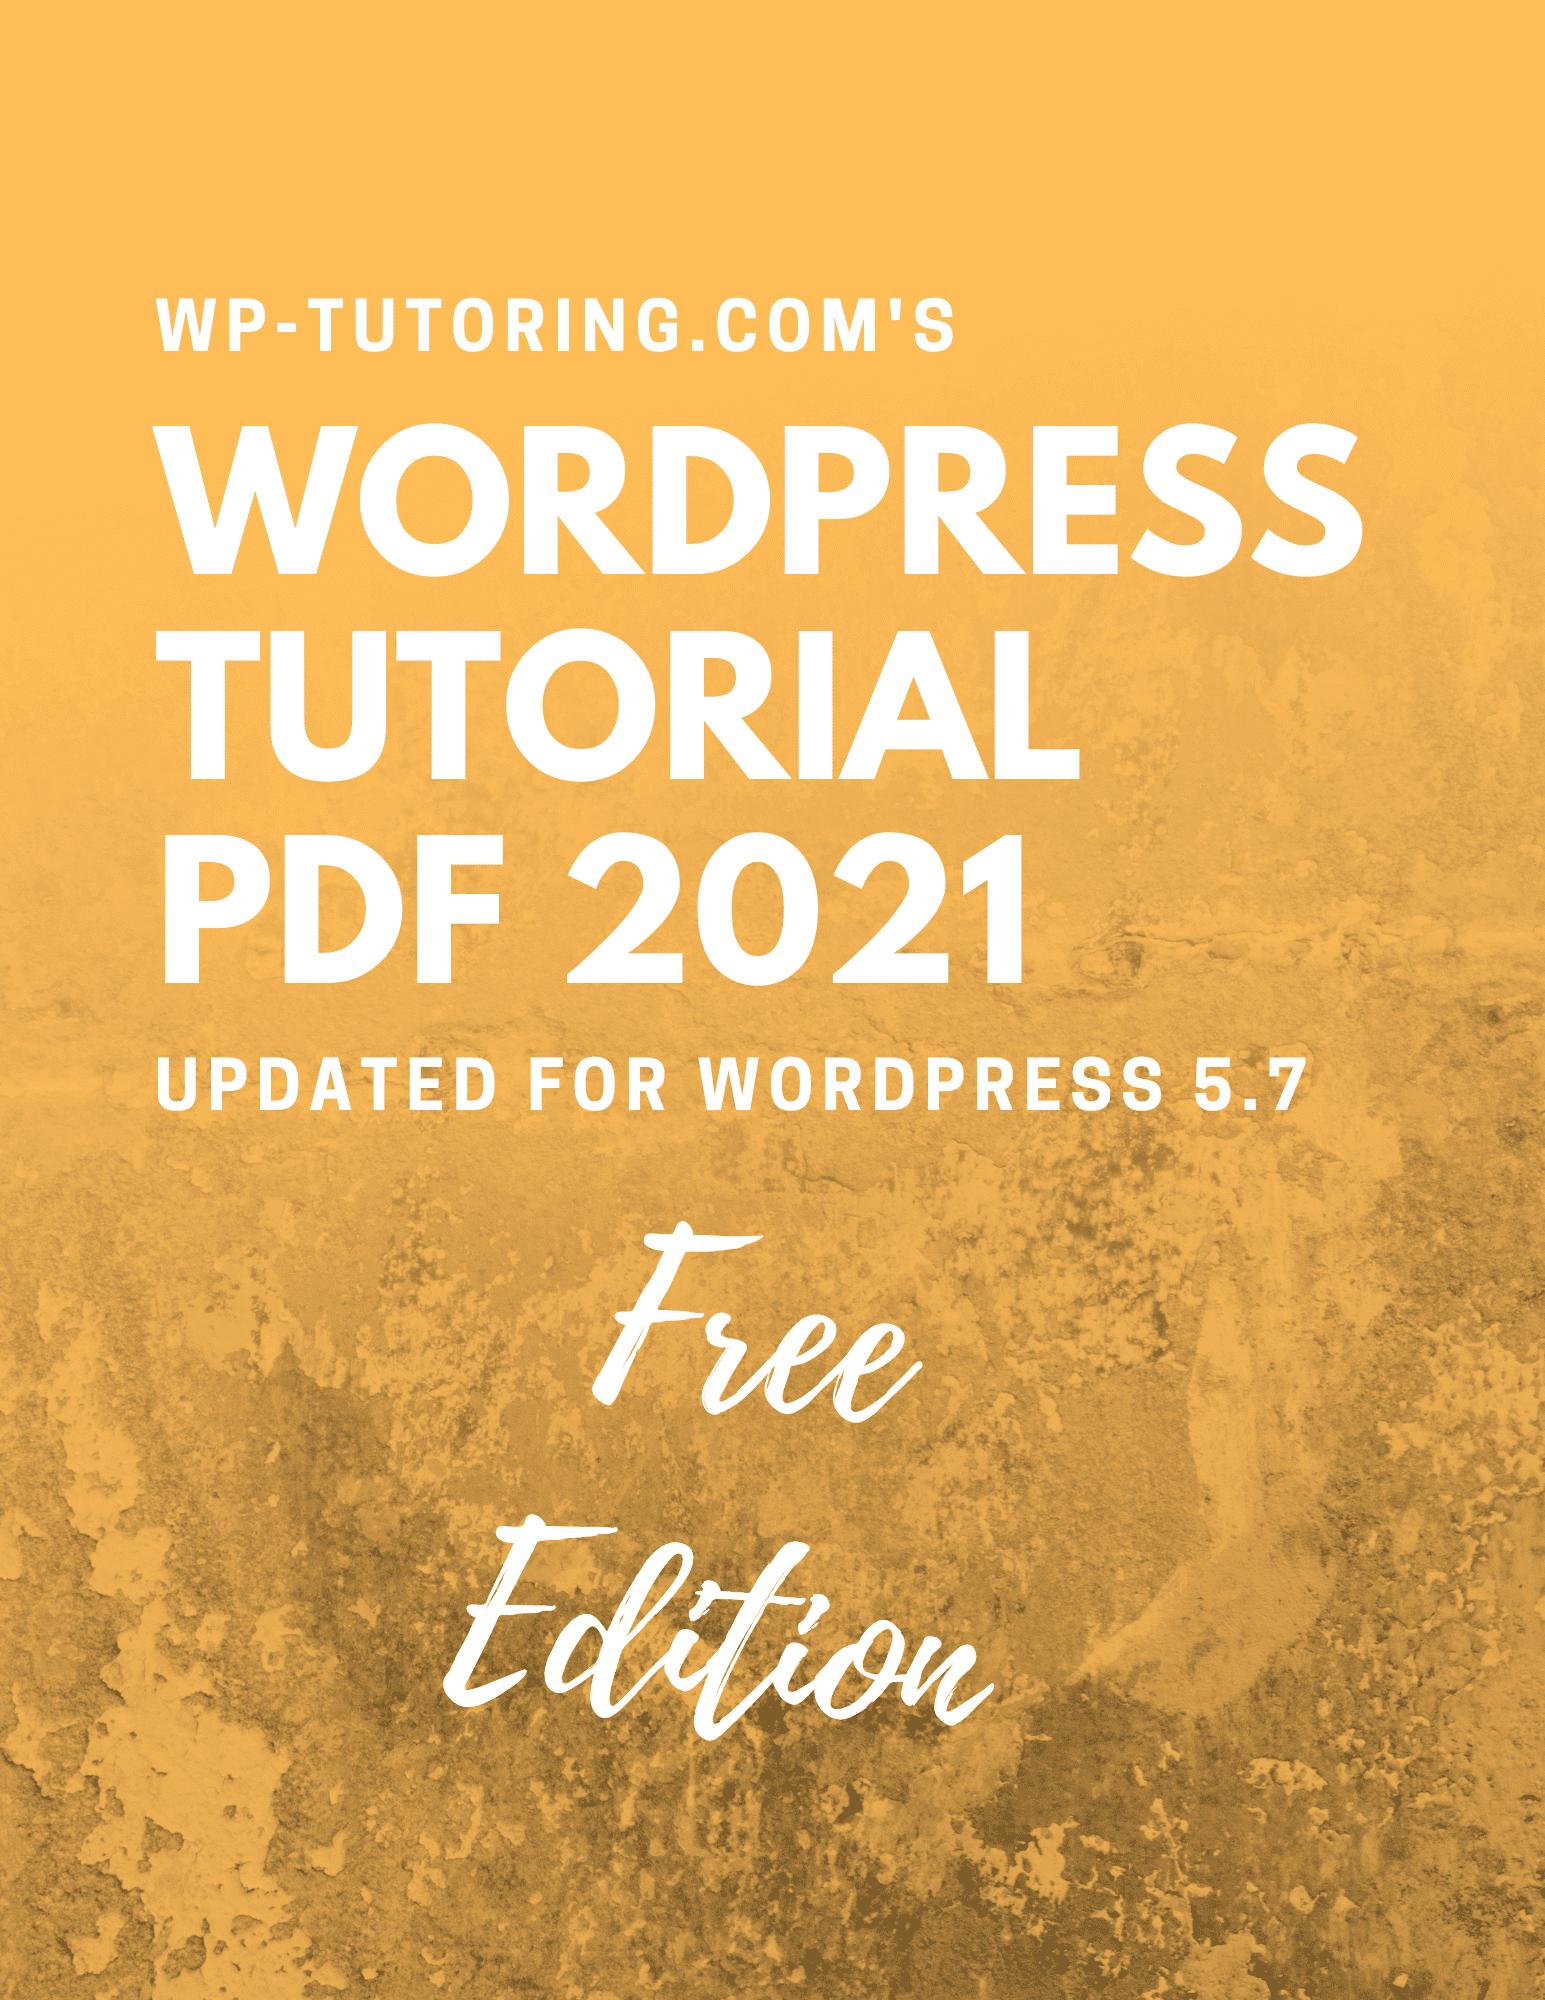 WordPress Tutorial PDF - Free